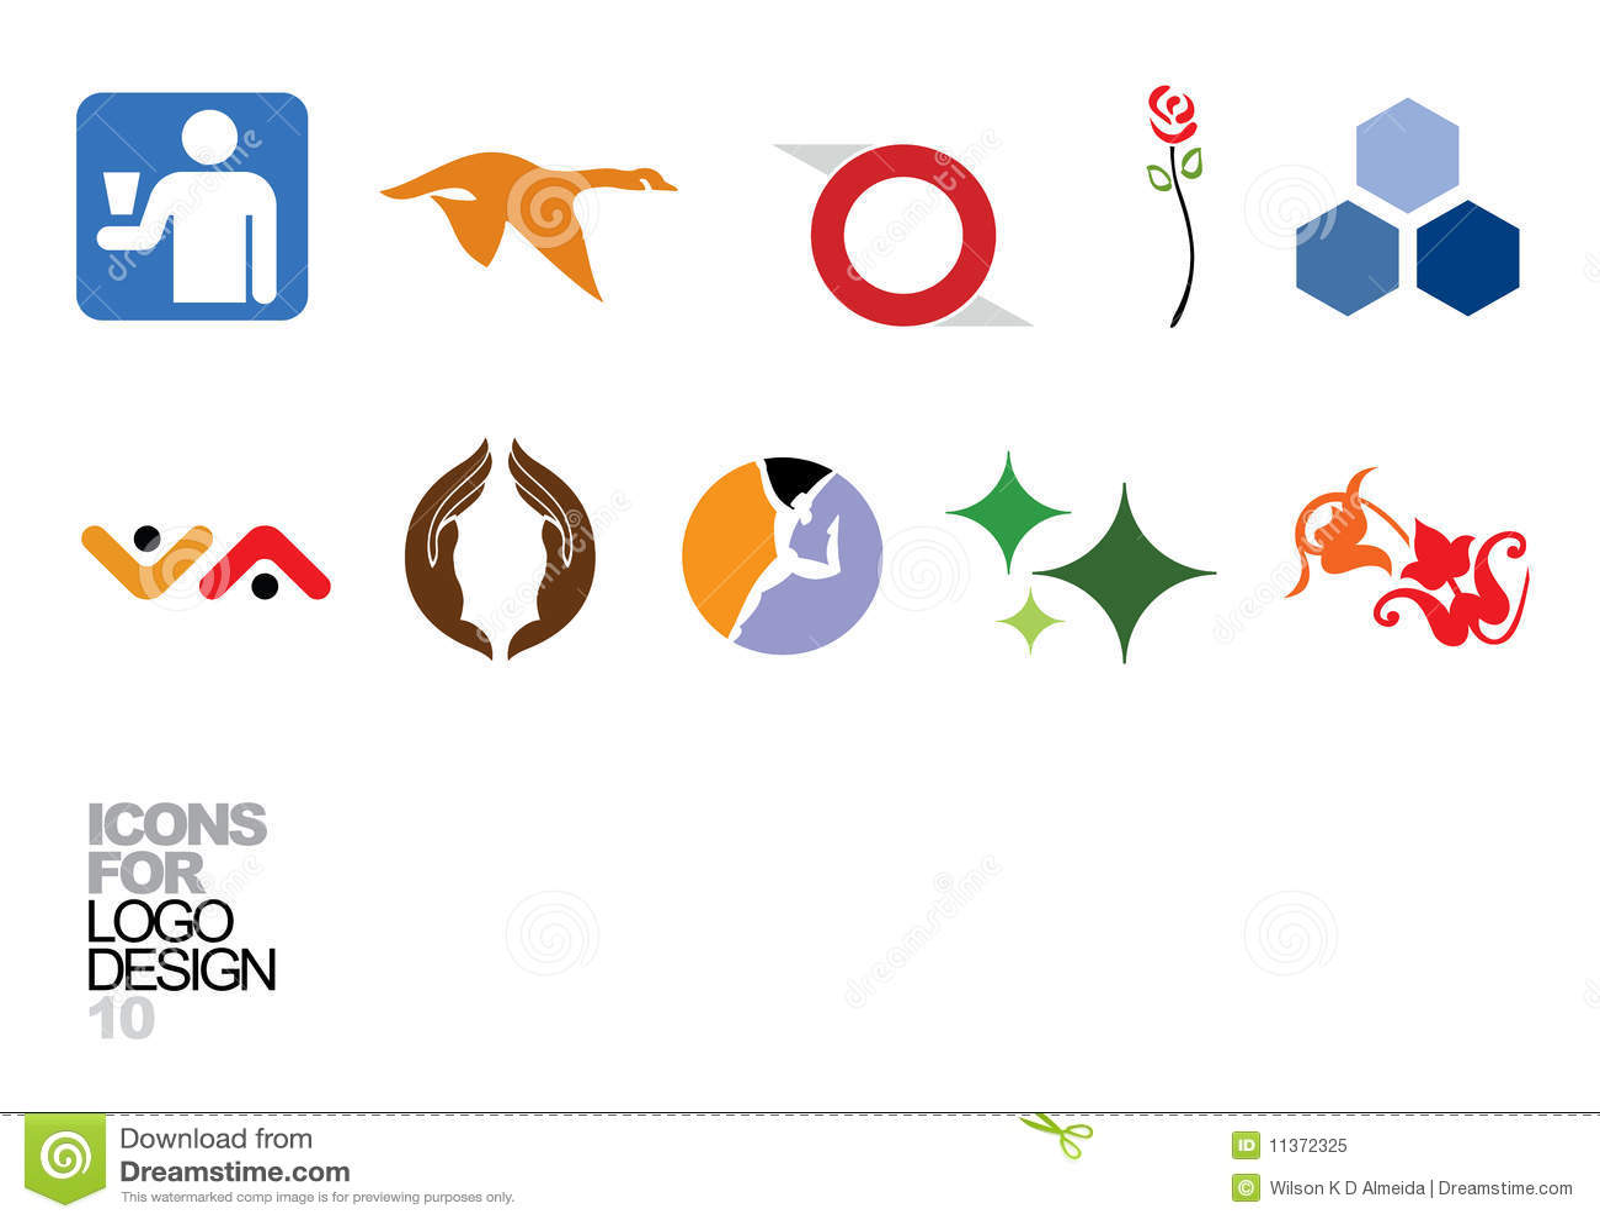 Logo design vector elements 10